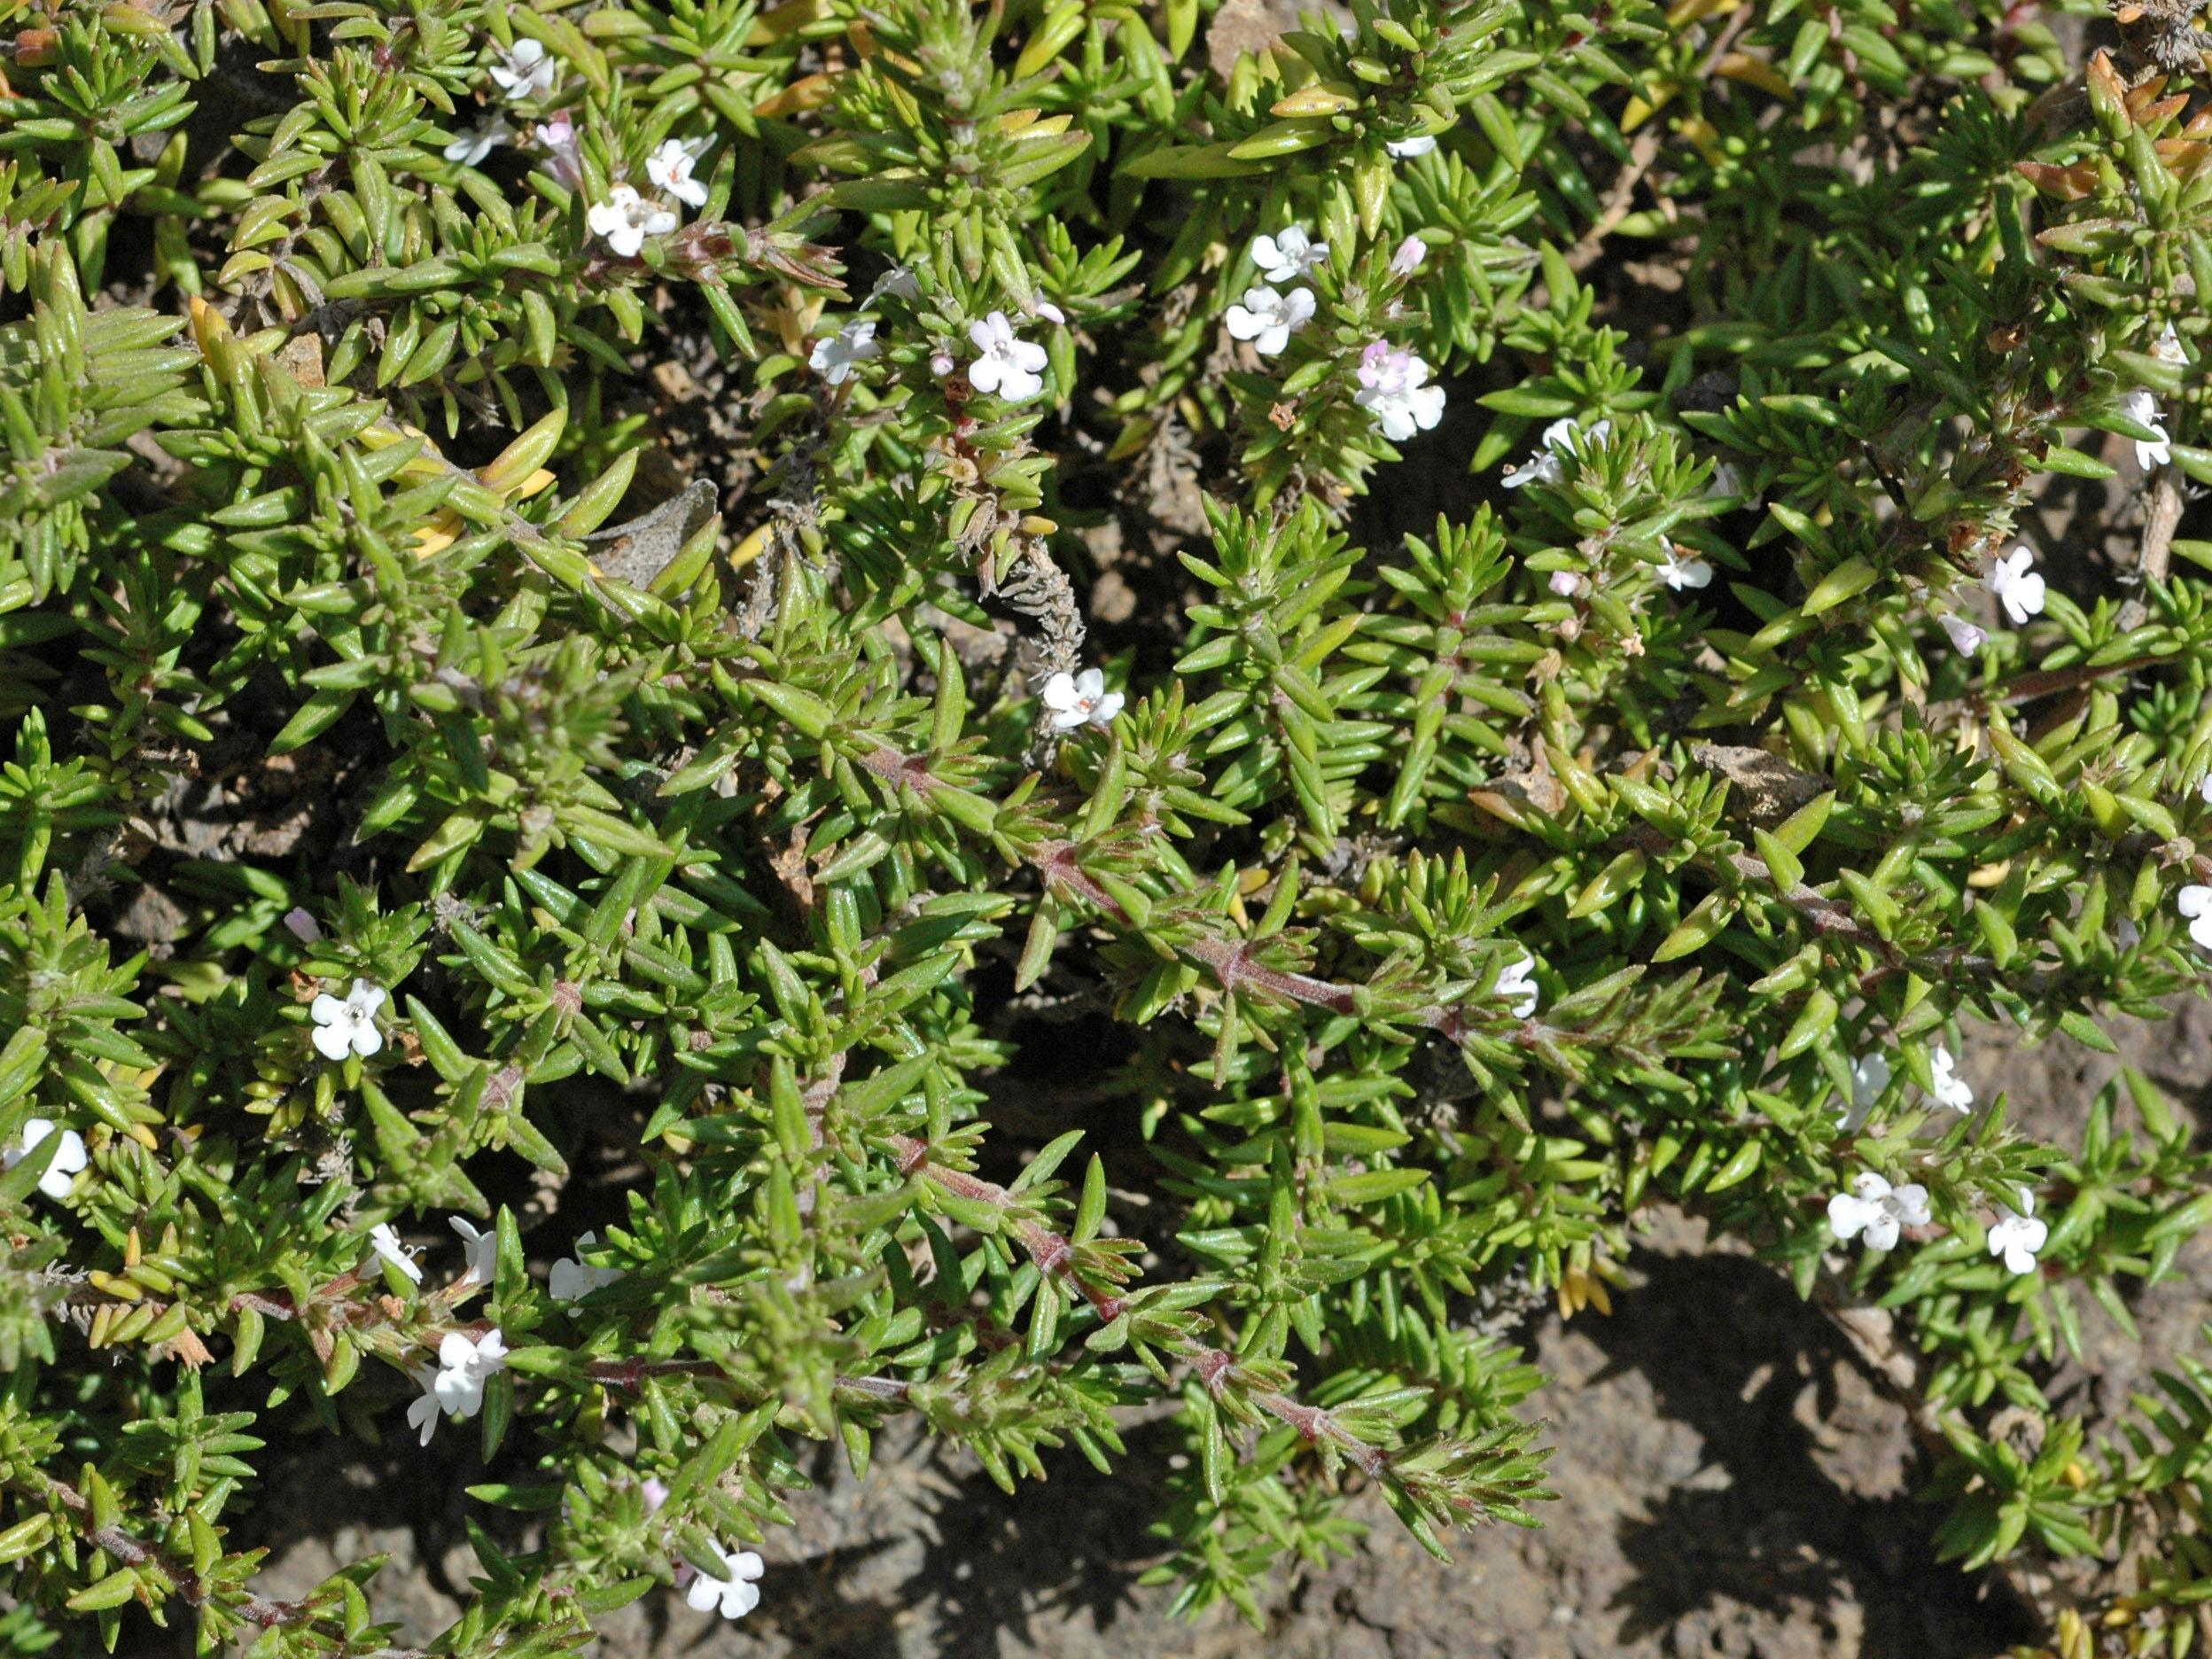 Micromeria varia